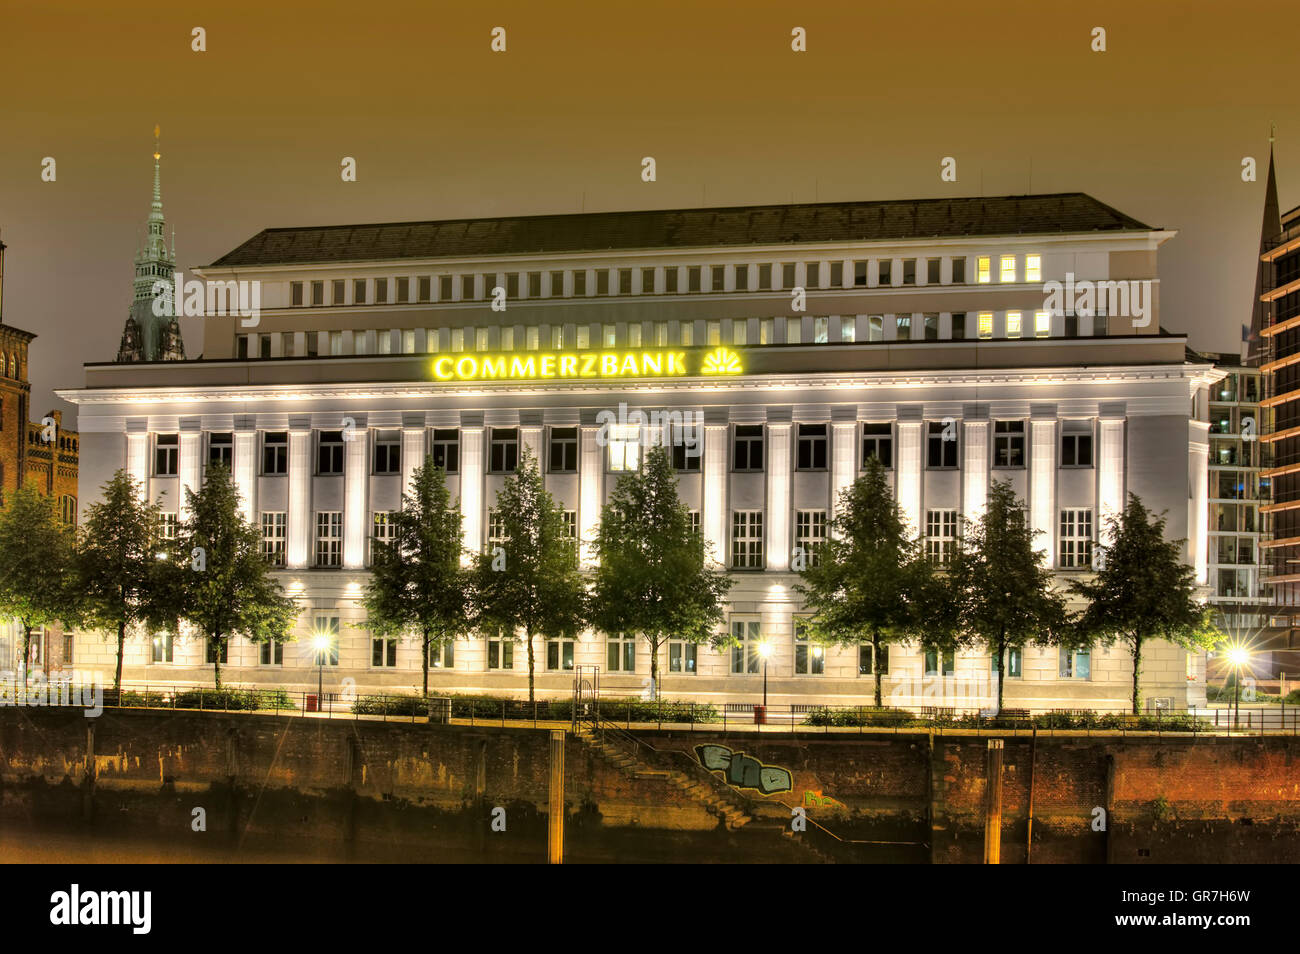 Commerzbank Building In Hamburg, Germany - Stock Image